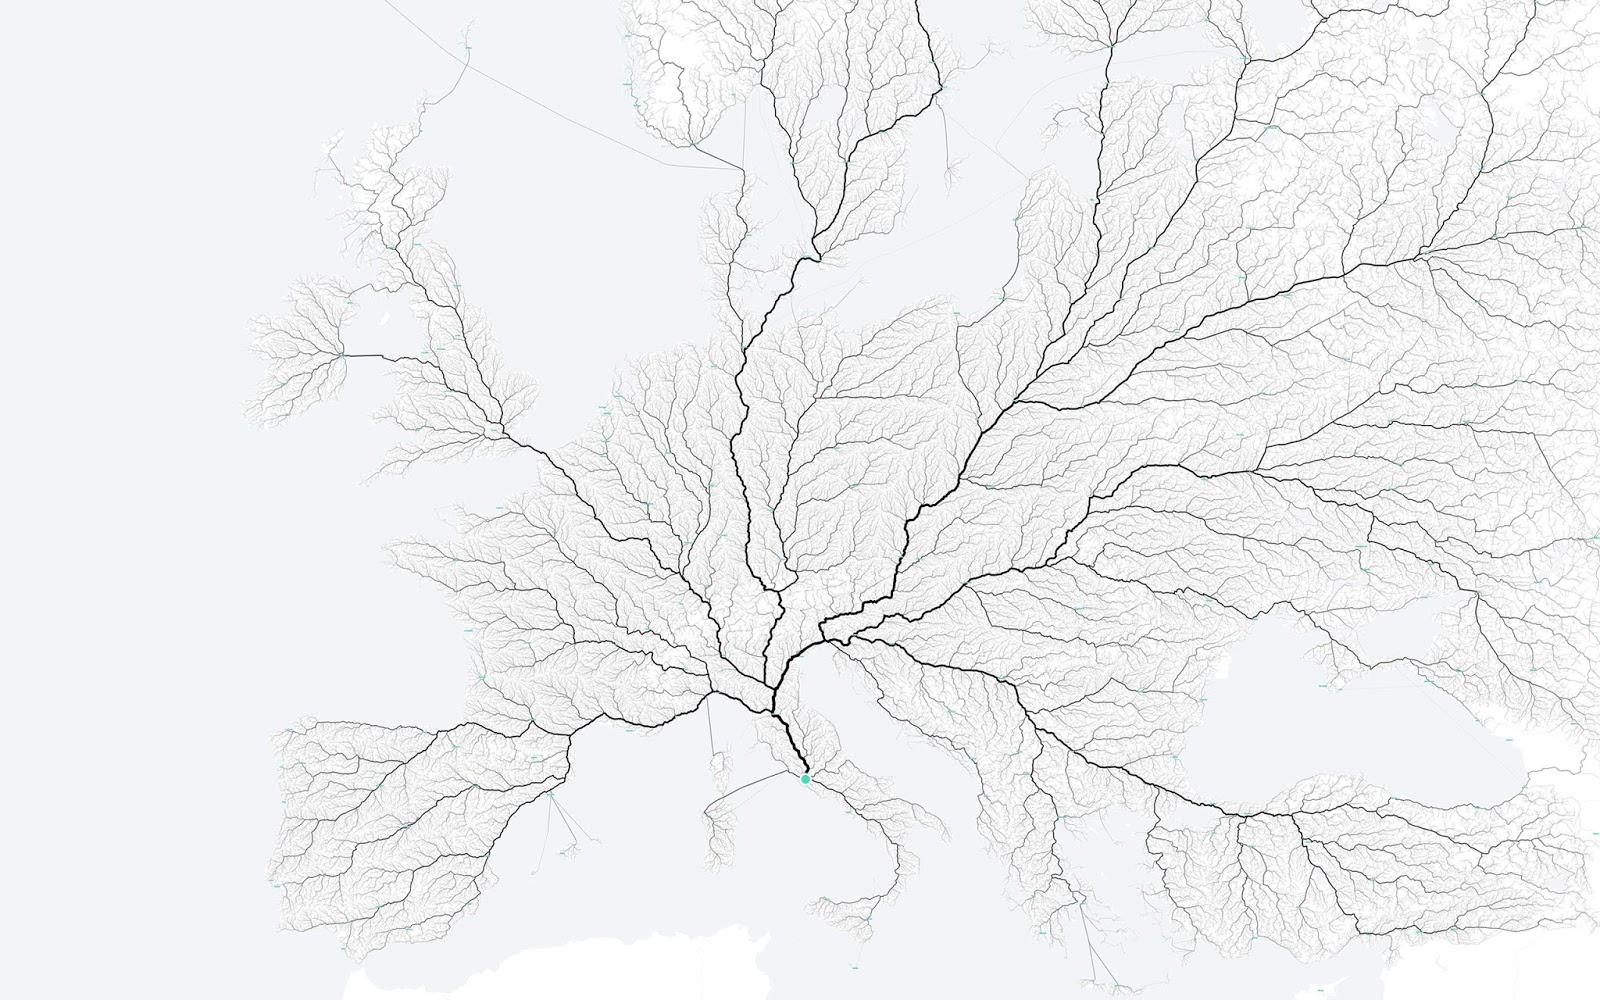 http://roadstorome.moovellab.com/images/eu_rome_web@2x.jpg